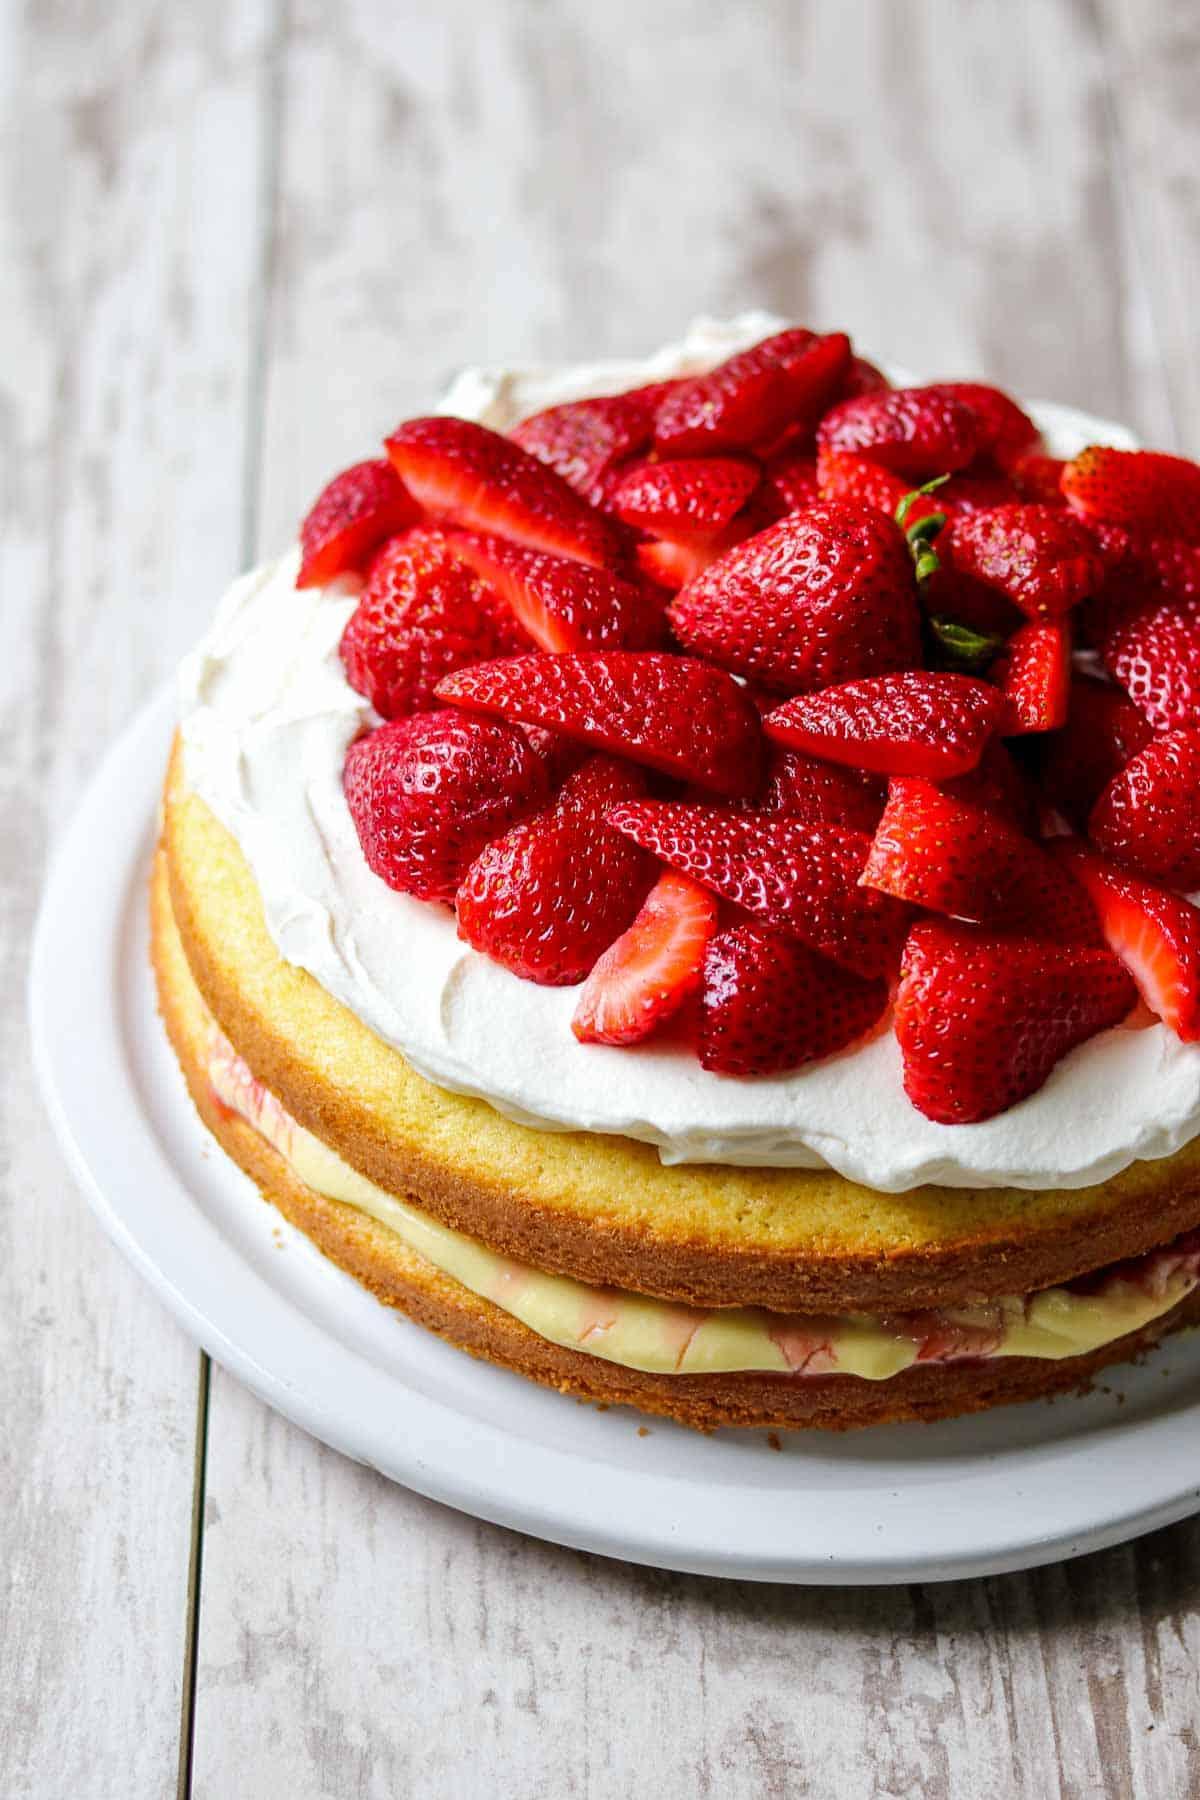 Scandinavian Strawberry Cream Cake on a wood surface.